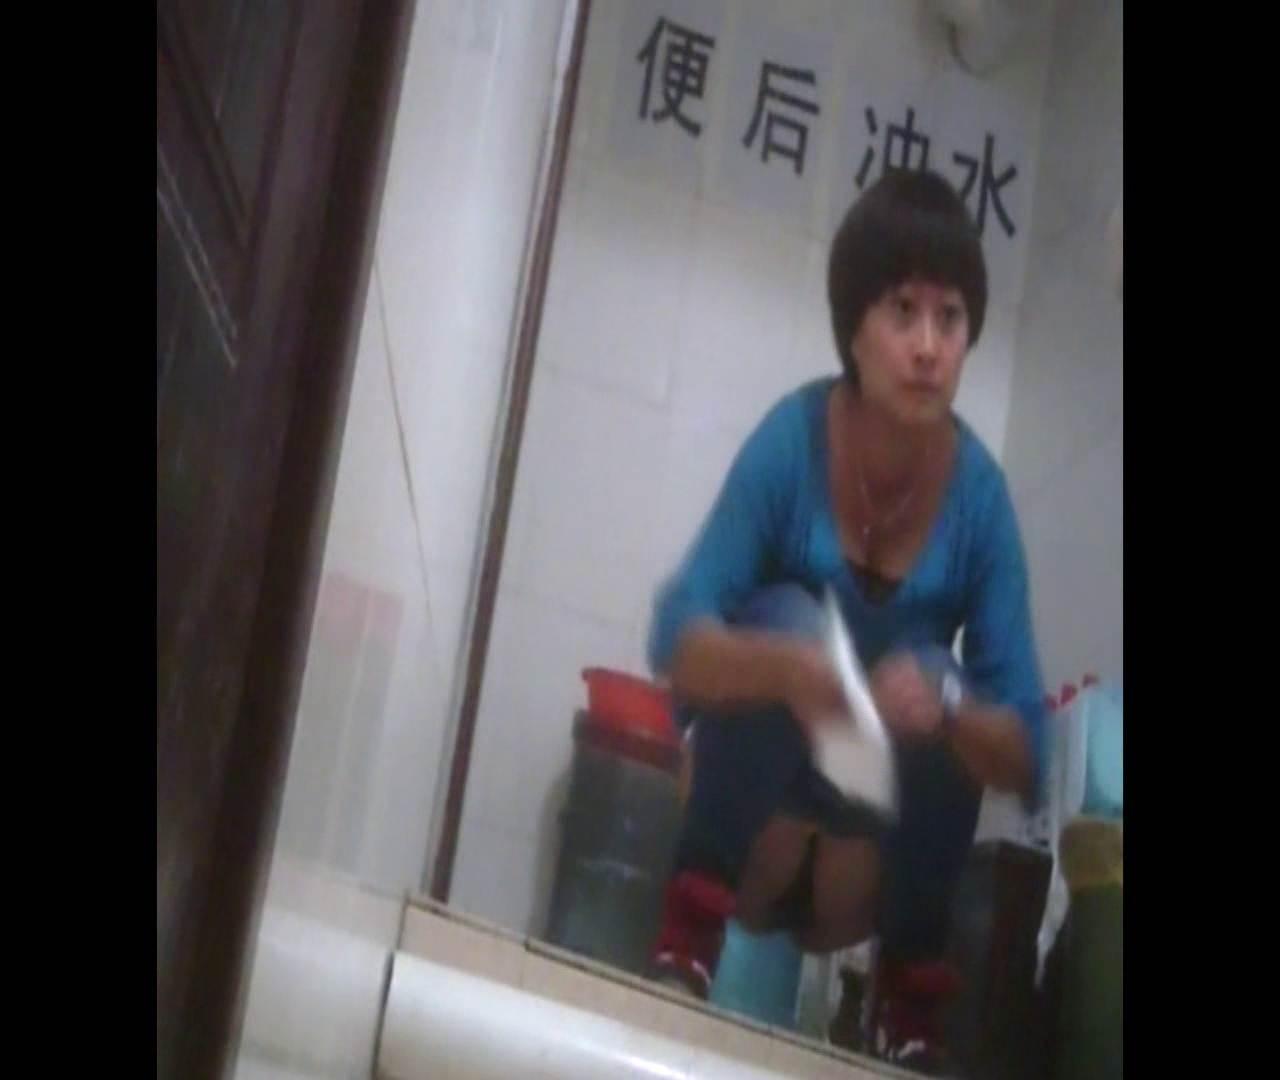 Vol.37 豊満な胸を持つマッシュルームカットな彼女 洗面所のぞき 性交動画流出 109枚 68